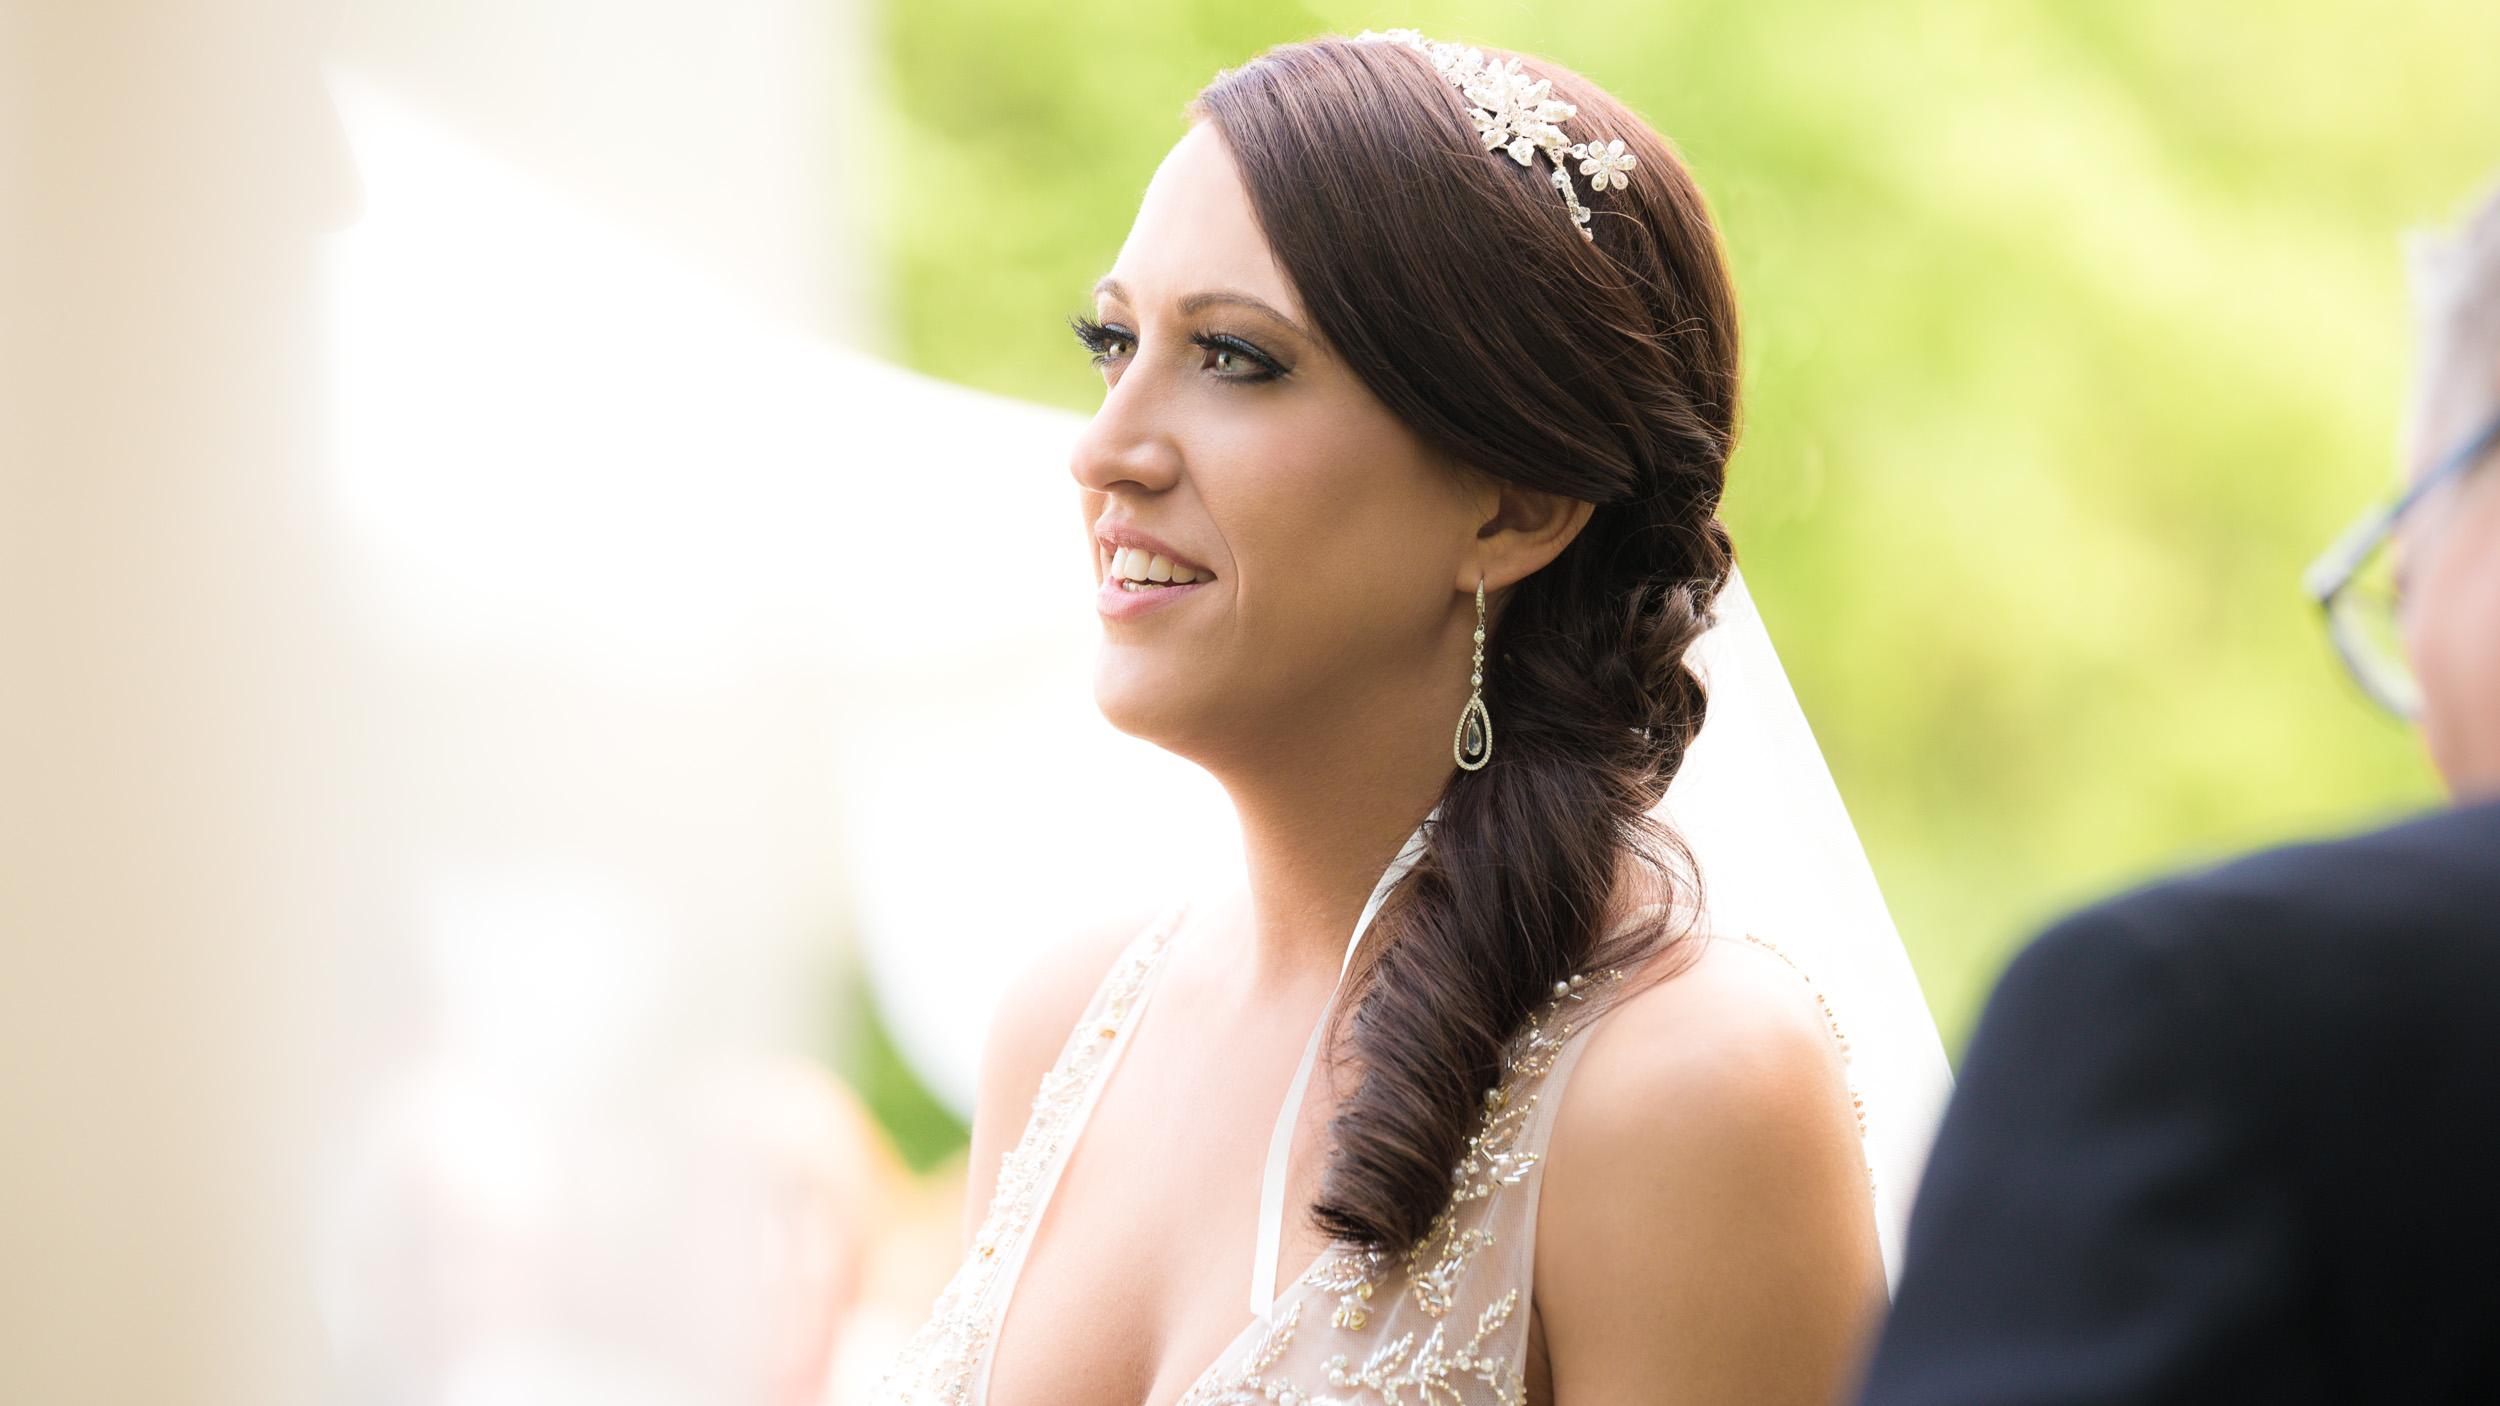 Wedding-ceremony-bride-portrait.jpg